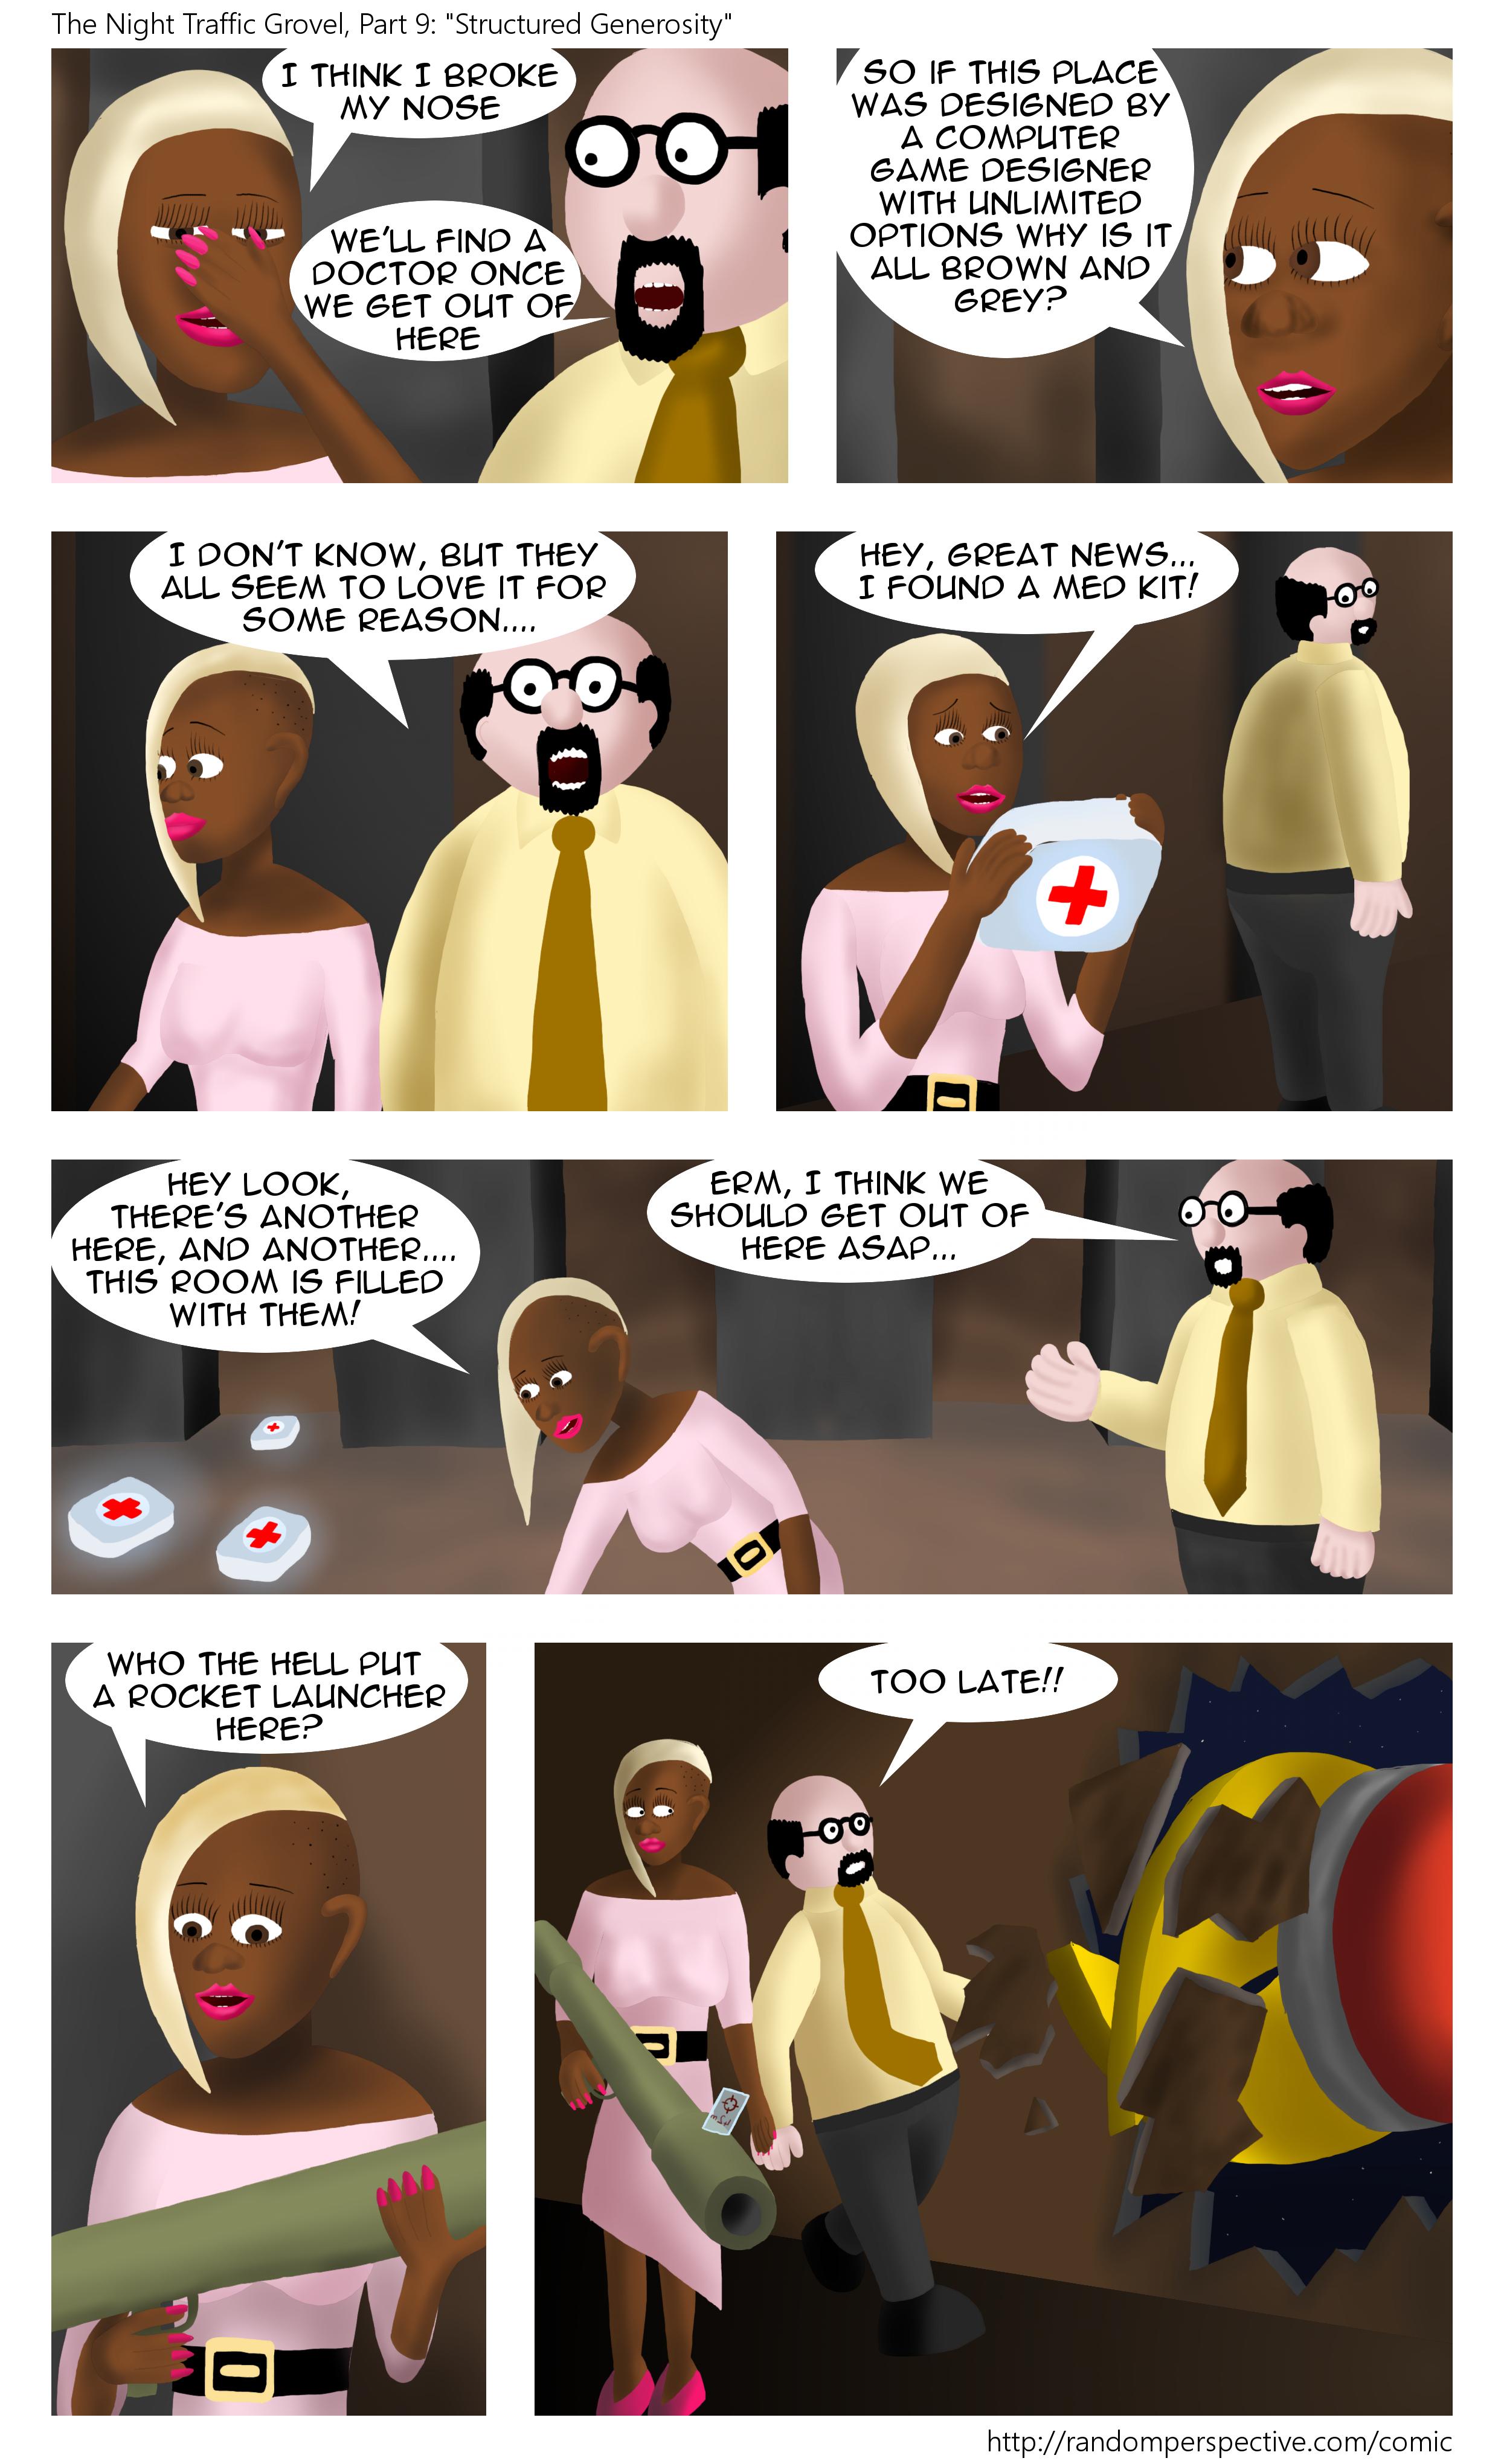 The Night Traffic Grovel, Part 9: Structured Generosity